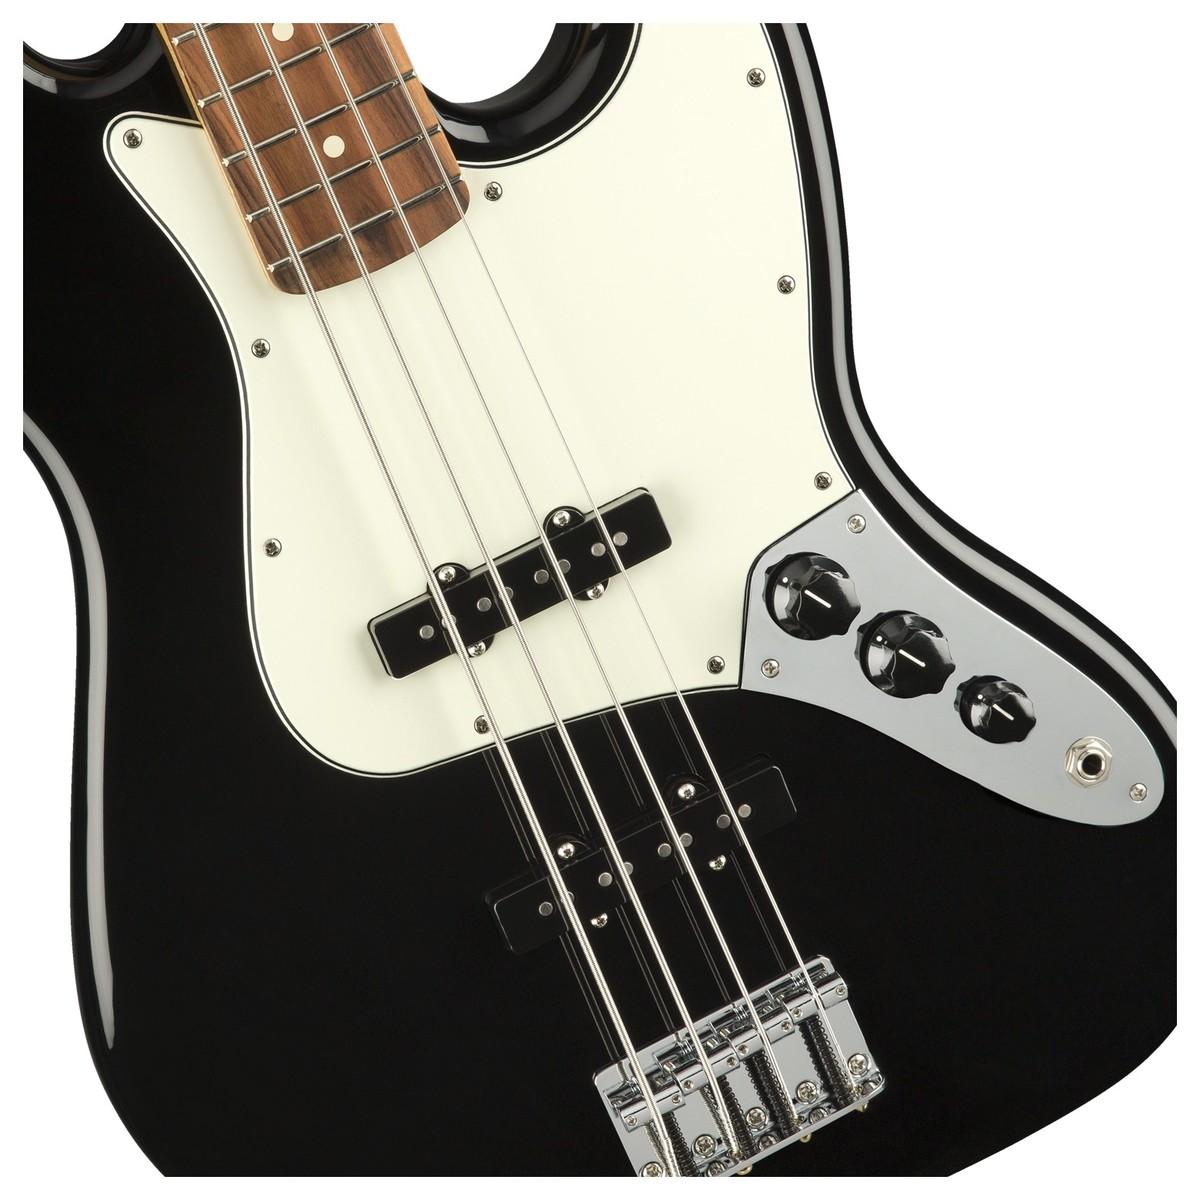 FENDER Player Jazz Bass PF Black 0149903506